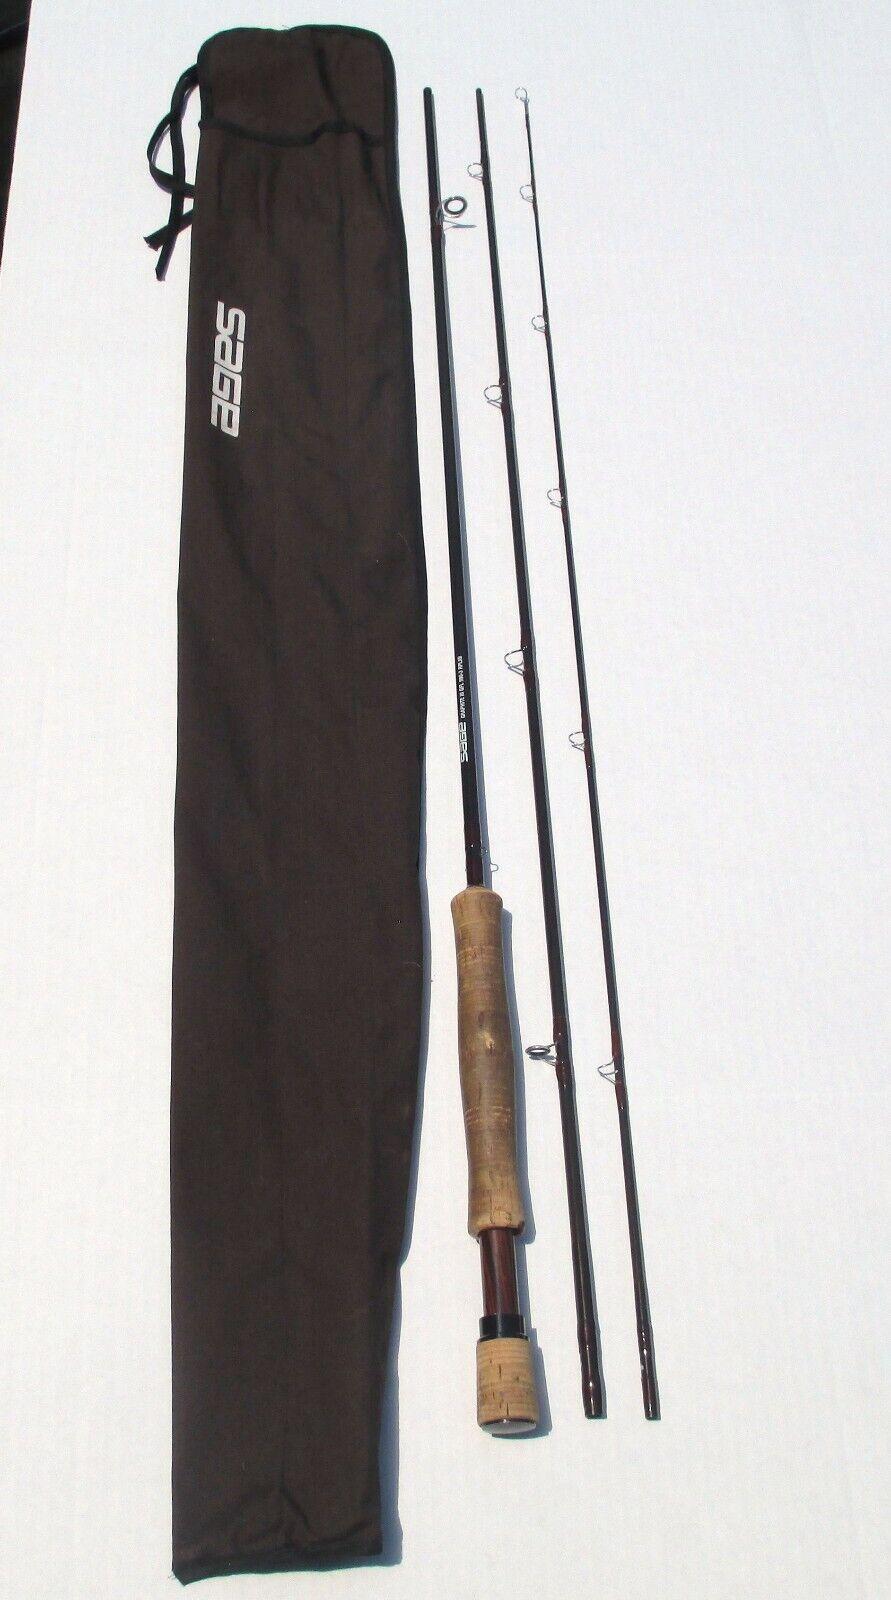 Sage GFL 990-3 rplxb 3 PC Pesca Con Mosca De Grafito Varilla W Bolsa 9'